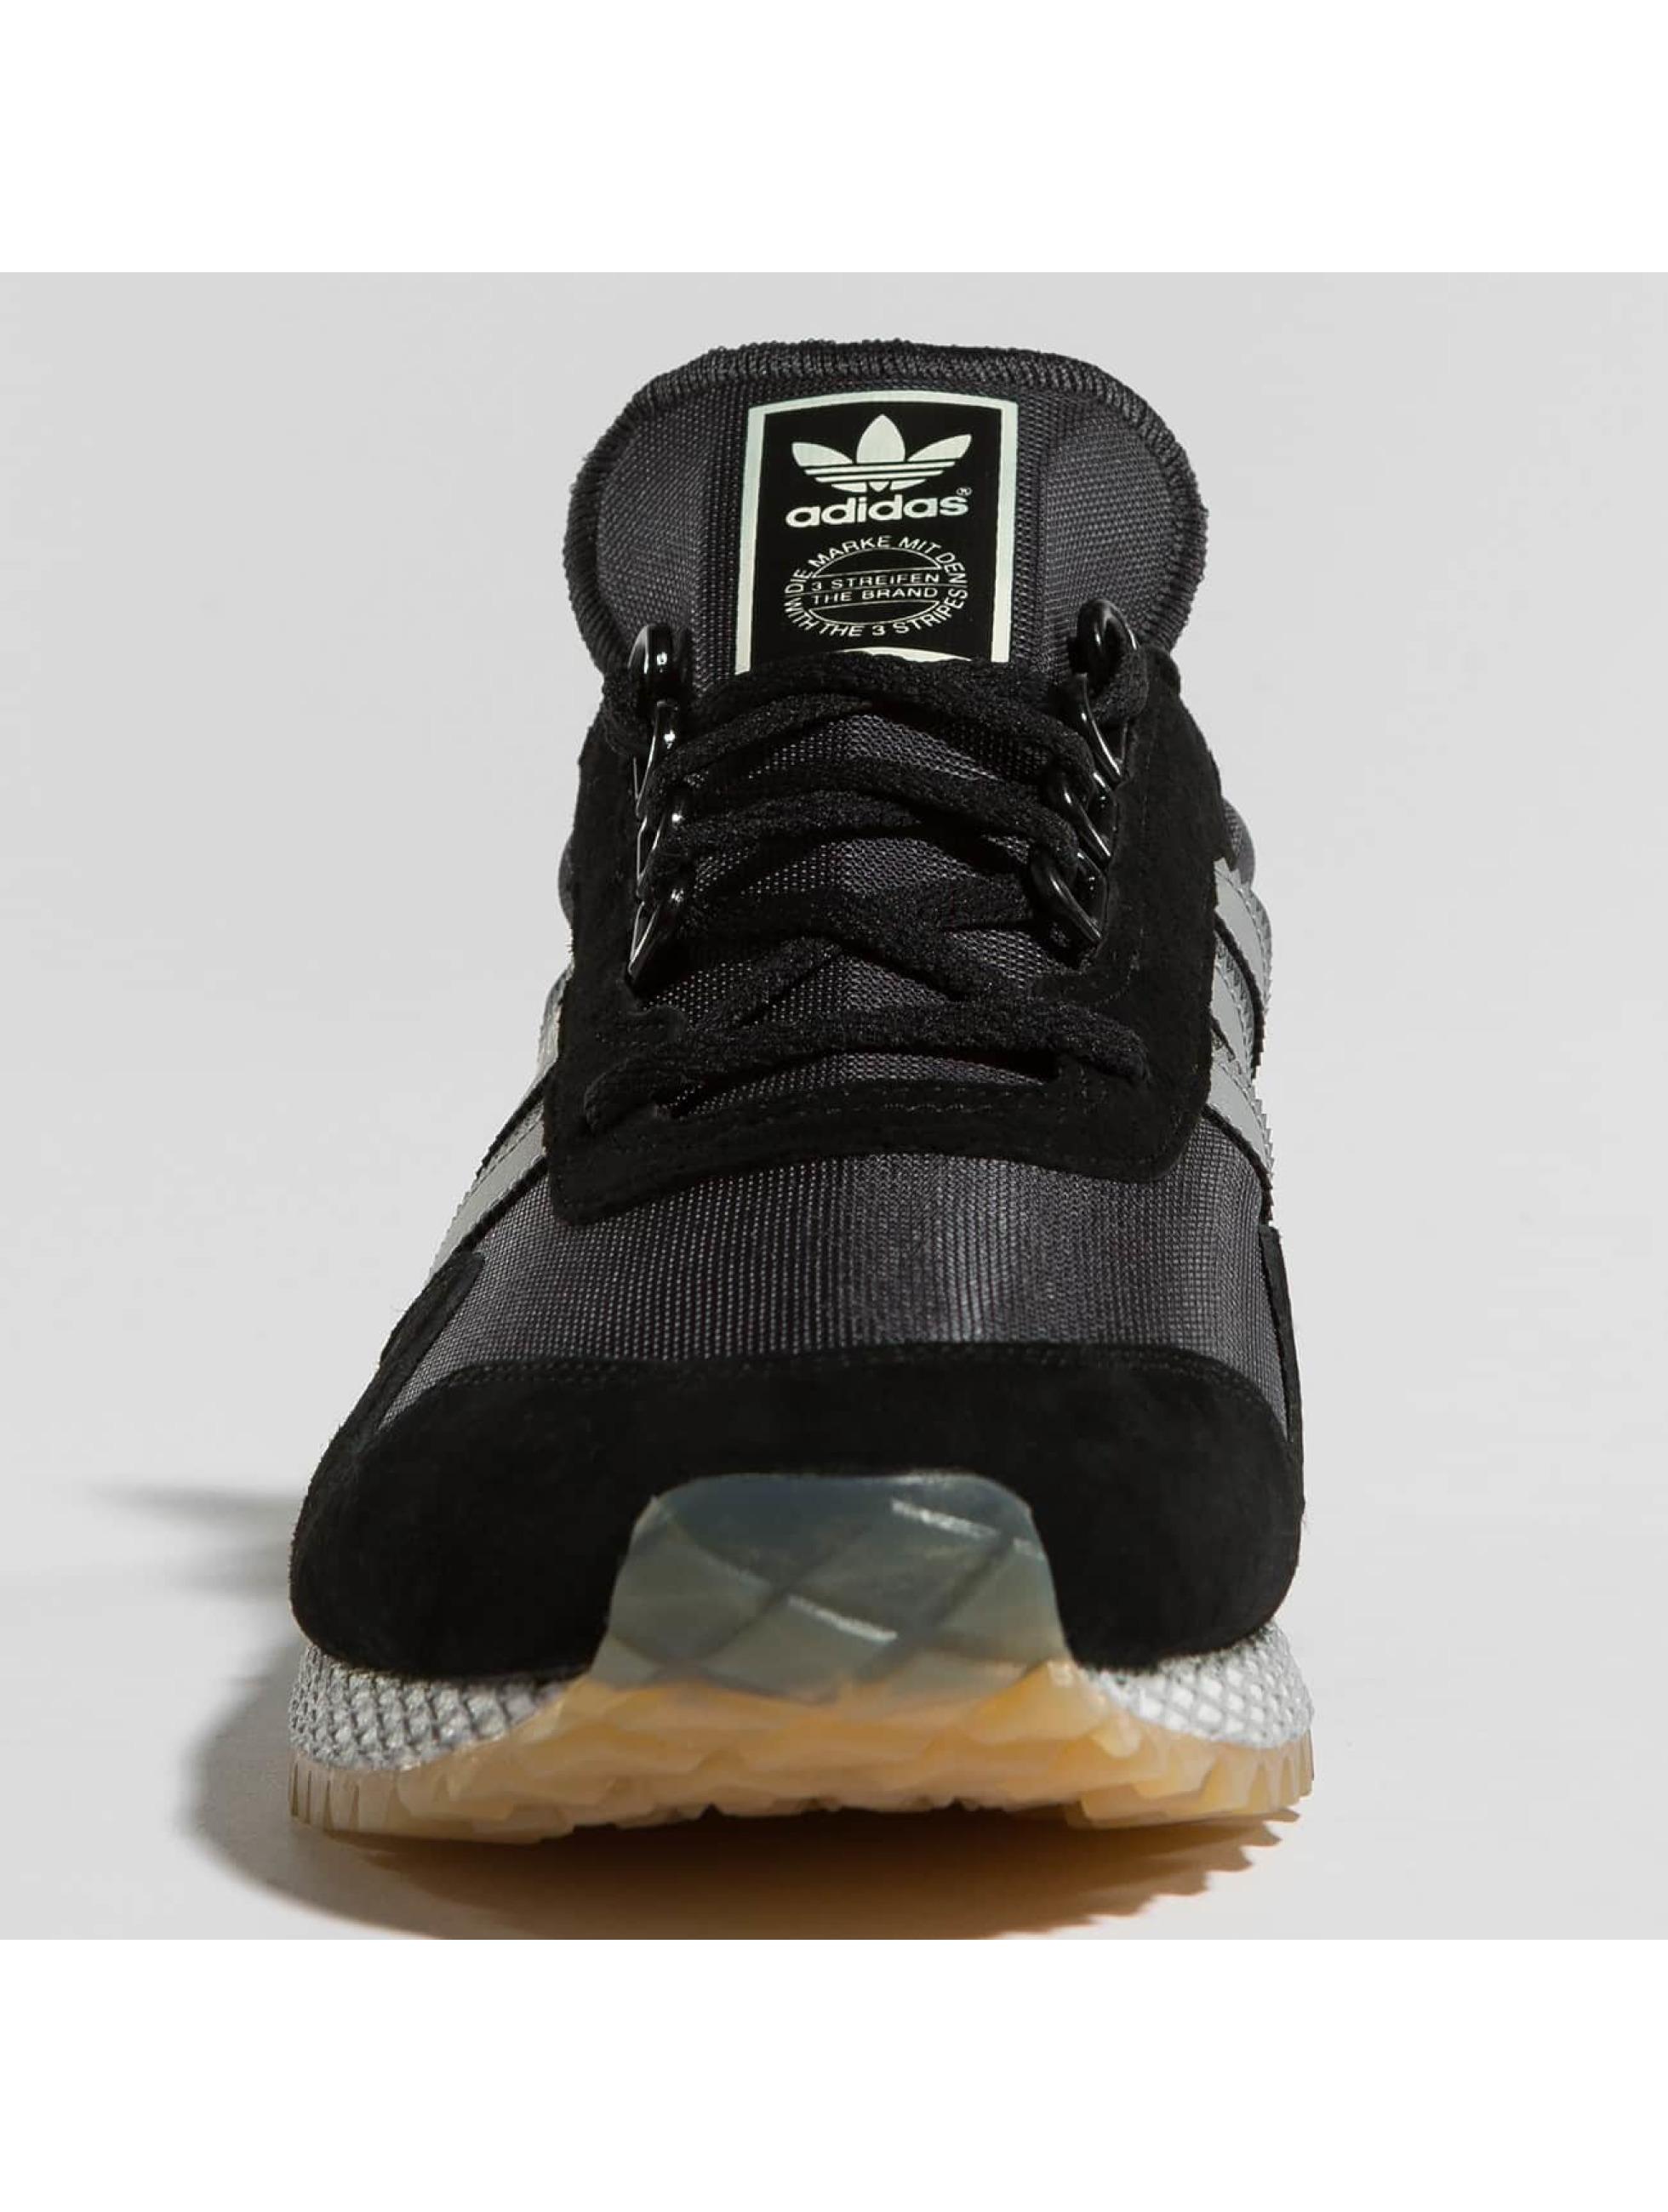 adidas Sneaker New Yorck schwarz